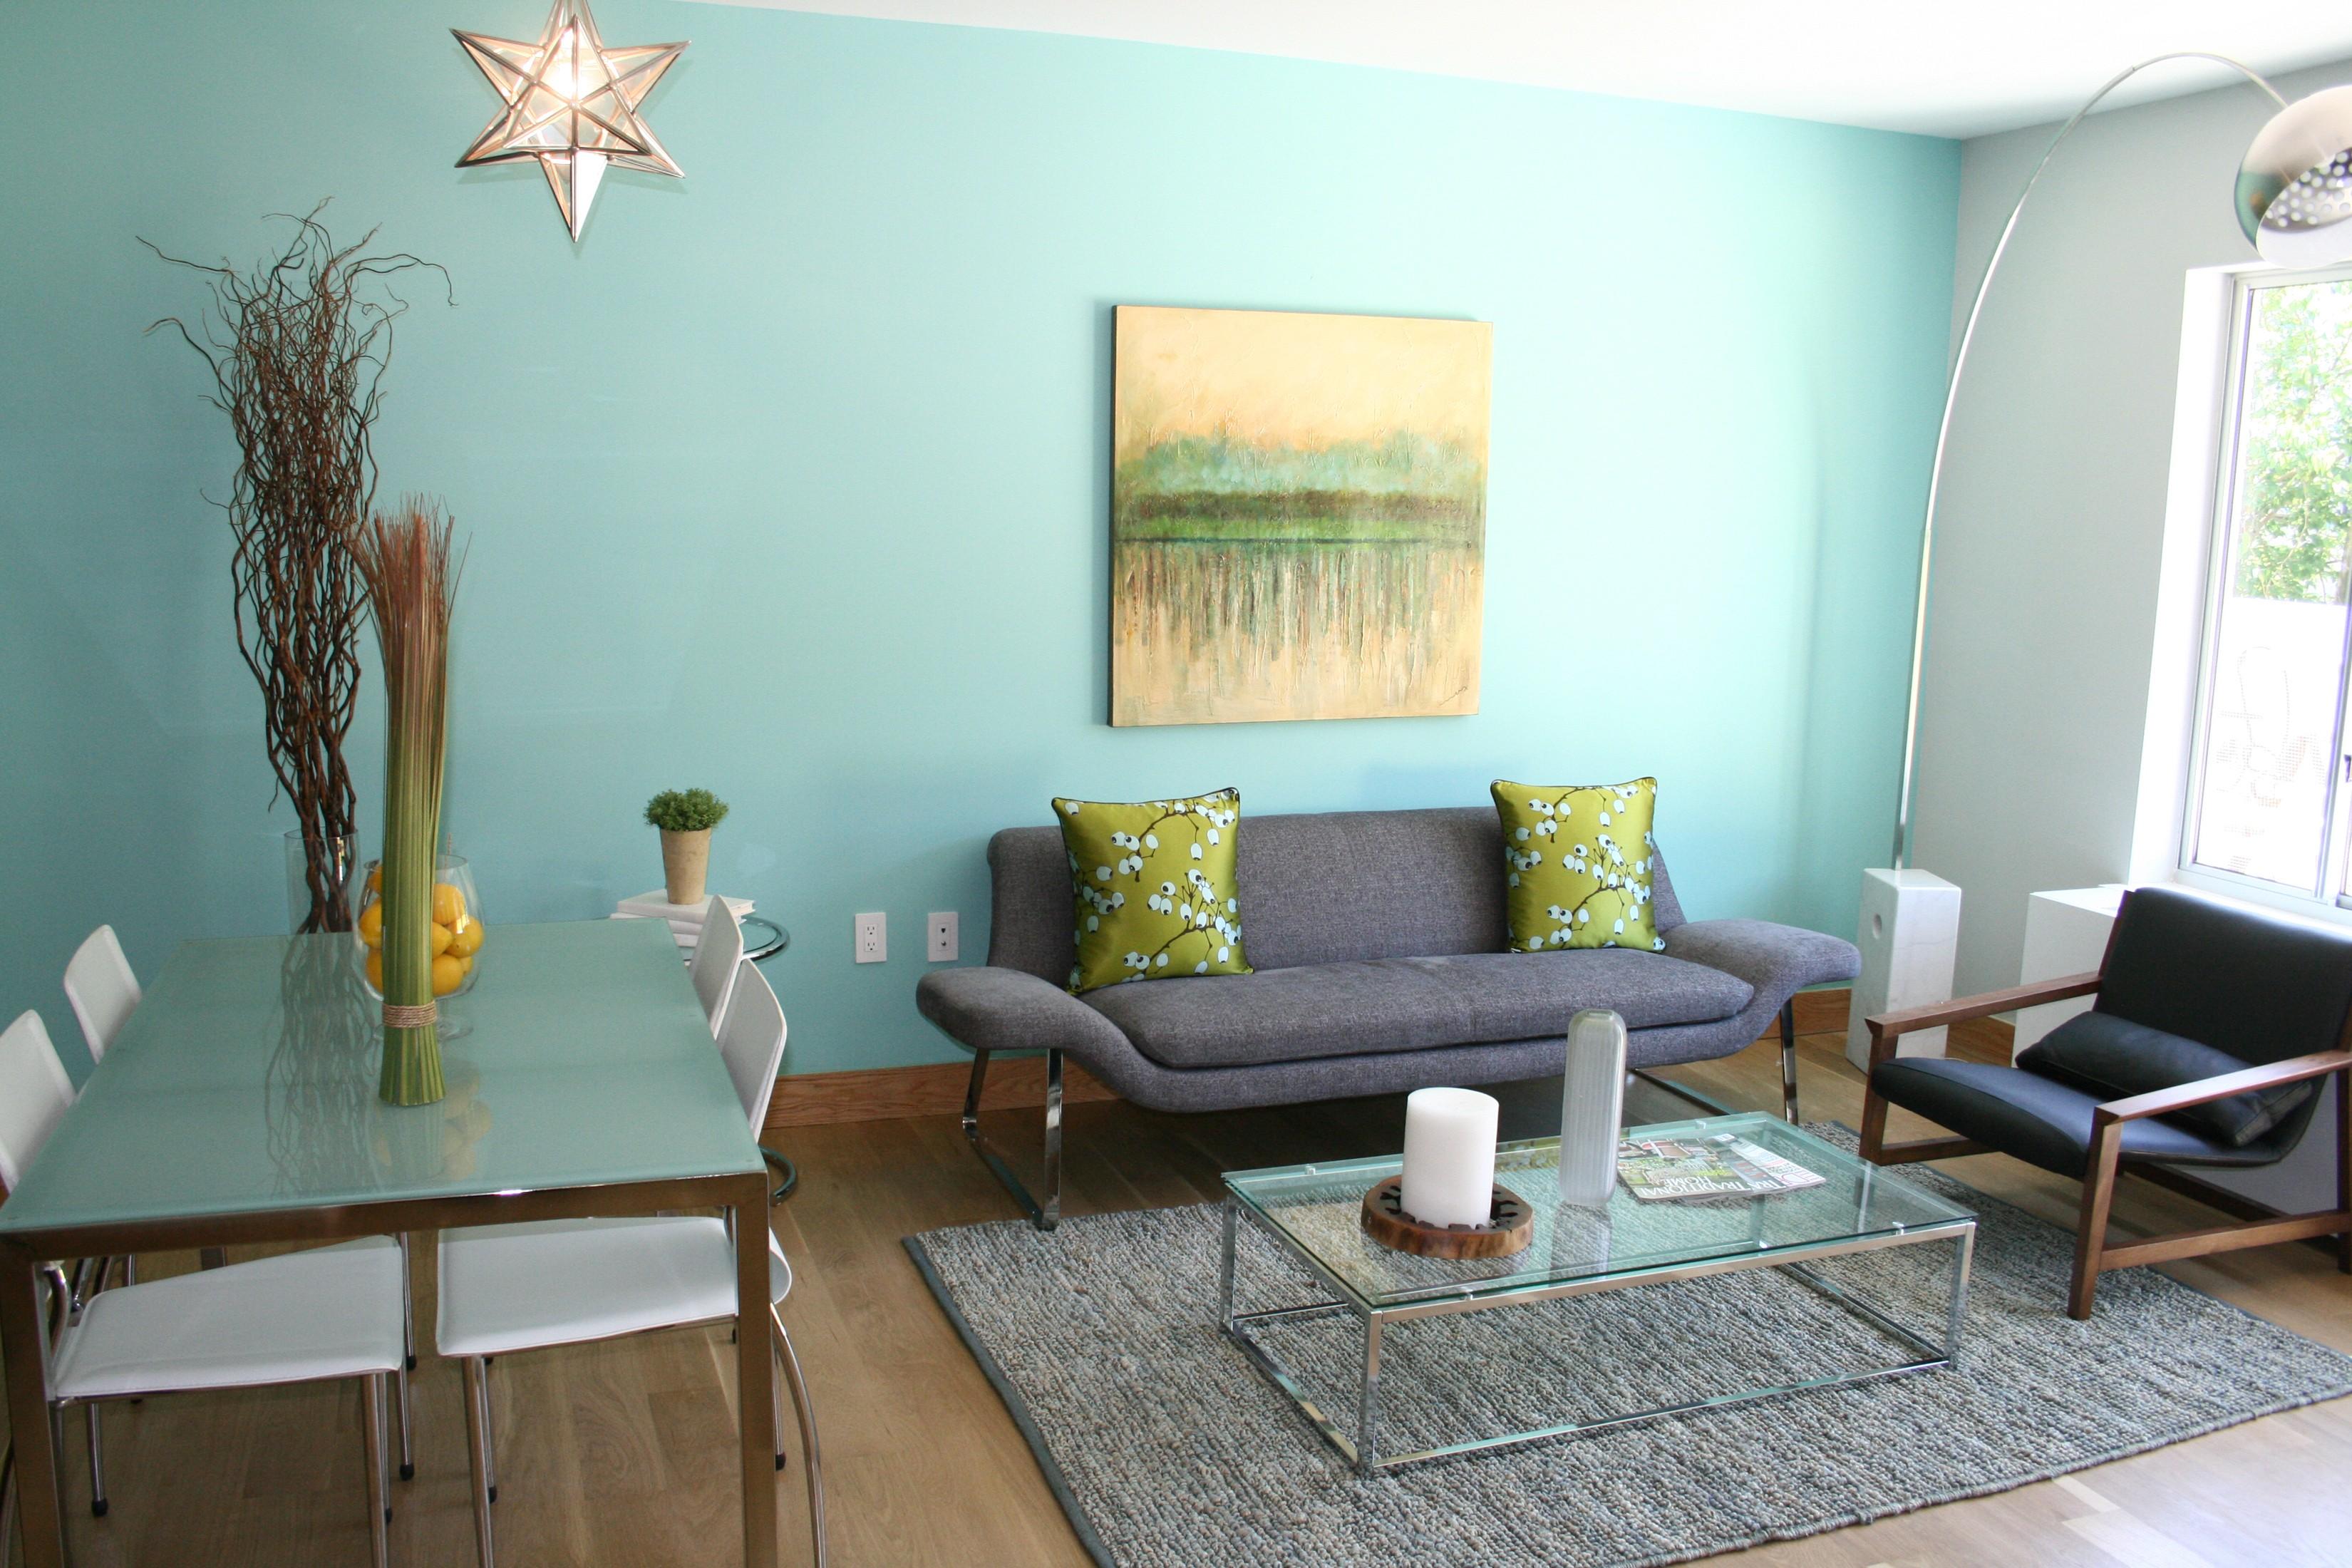 Living Room Apartment Decorating Apartment Living Room Design Decoration